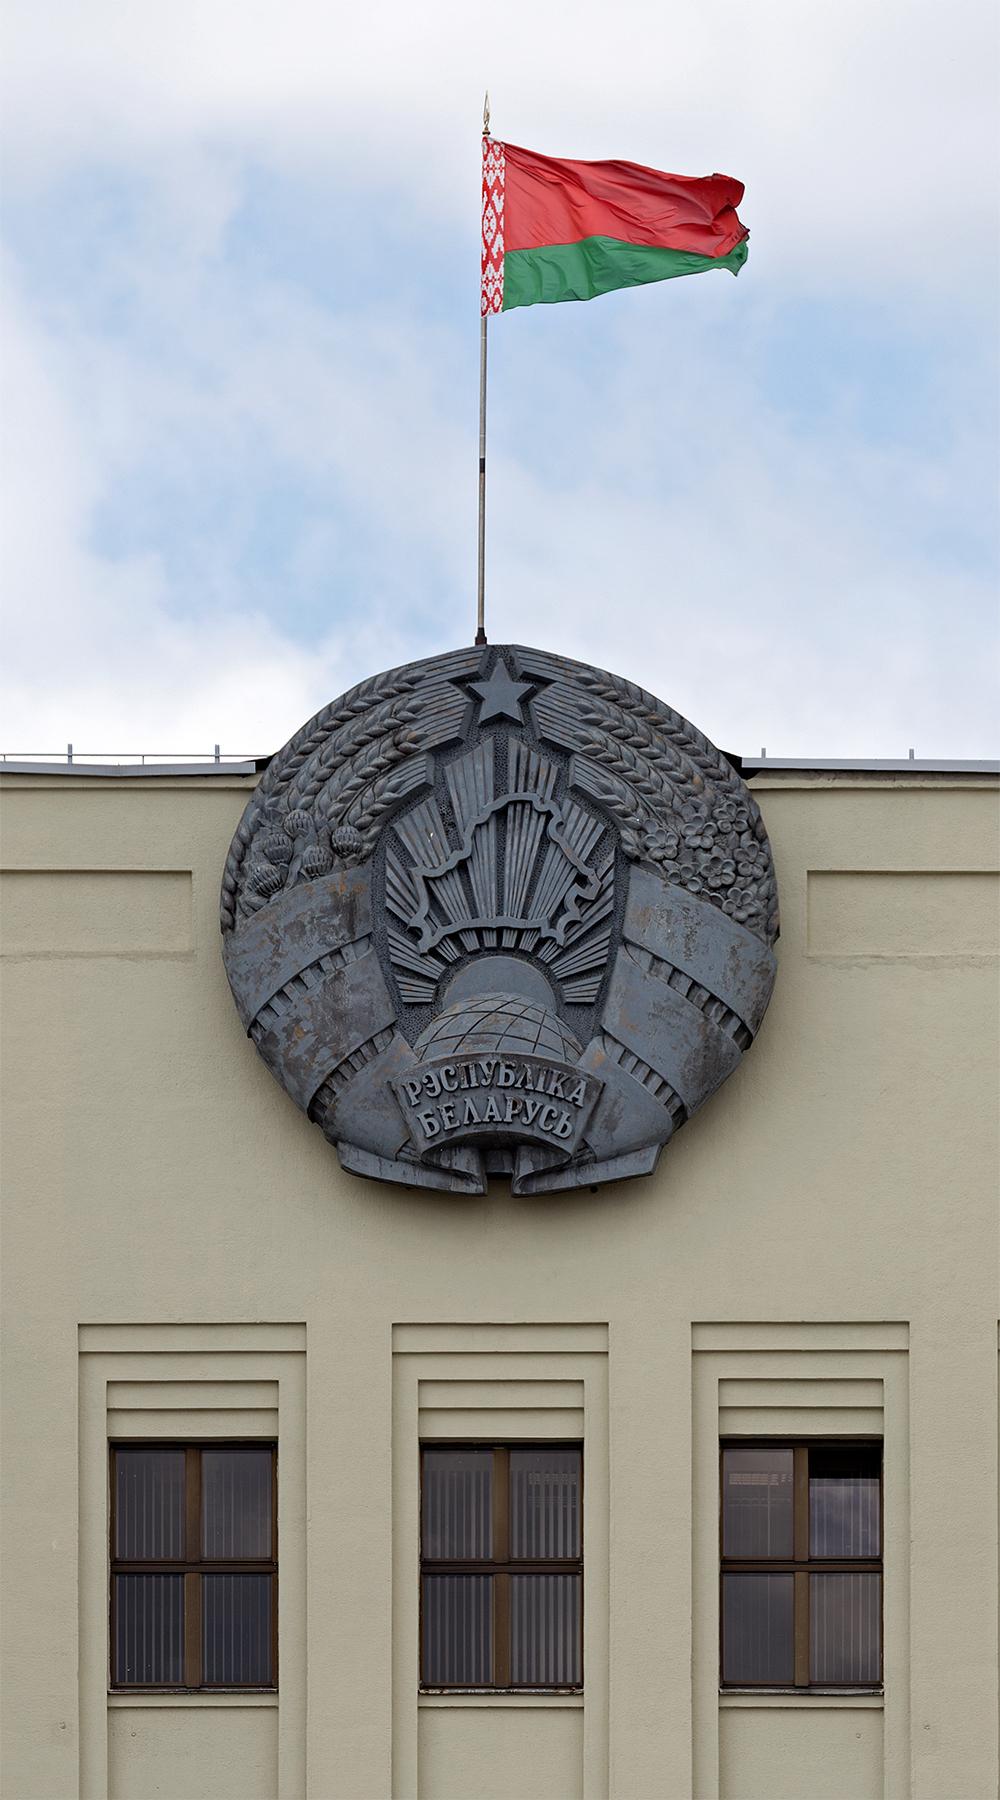 Staatswappen und Staatsflagge der Republik Belarus in Minsk